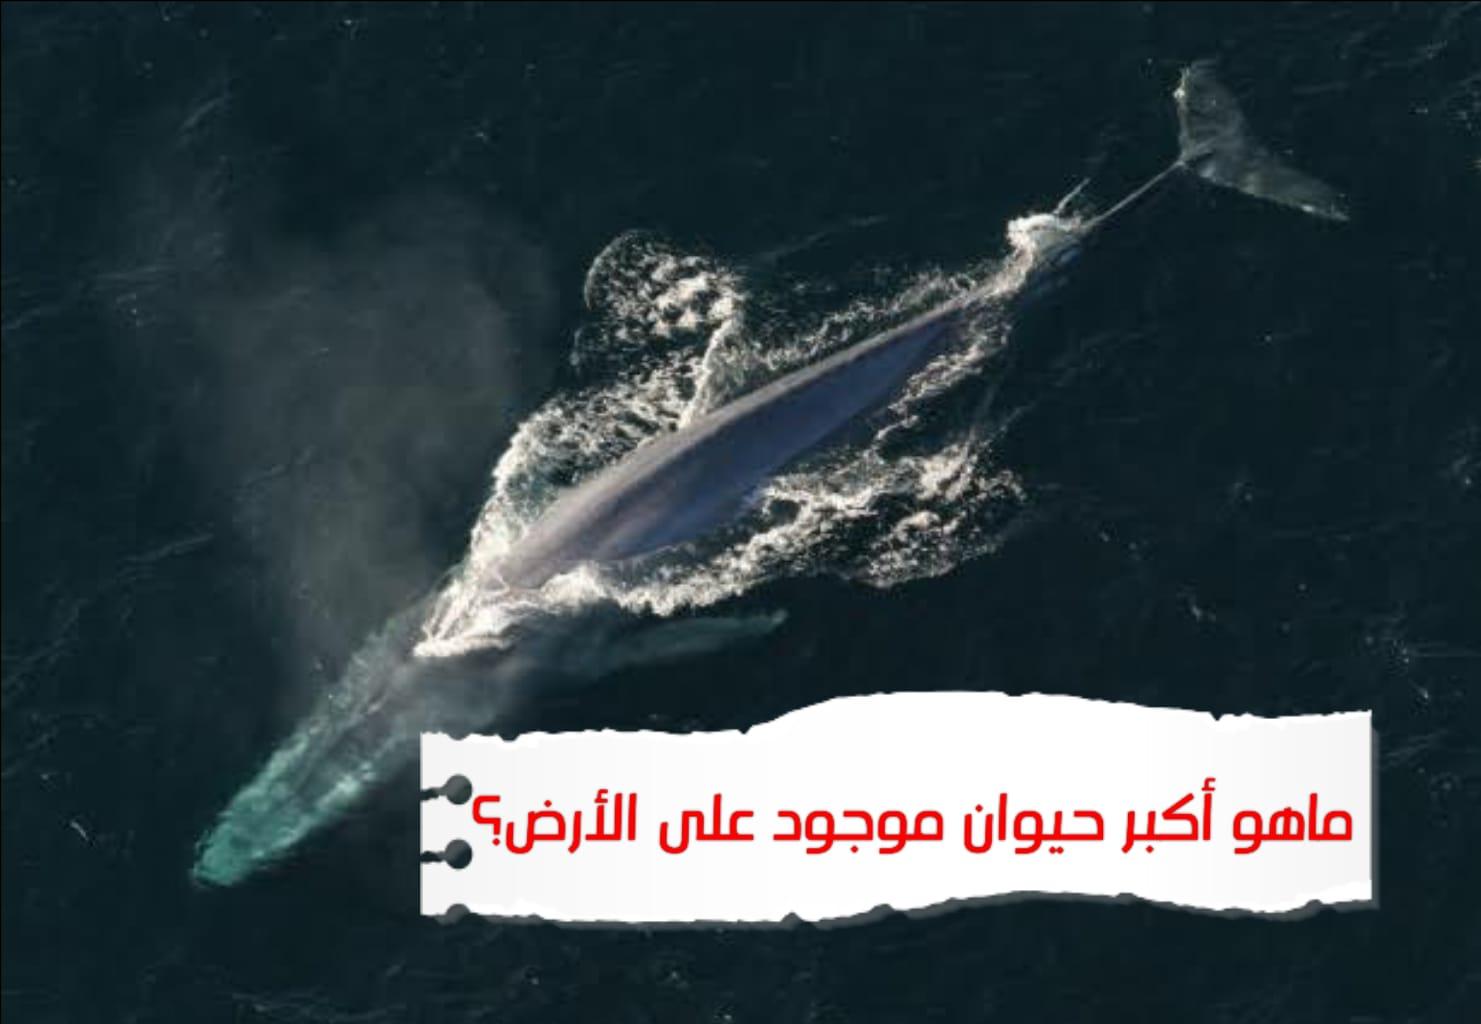 WhatsApp Image 2020 06 24 at 5.35.49 PM - ما هو أكبر حيوان موجود على الأرض؟